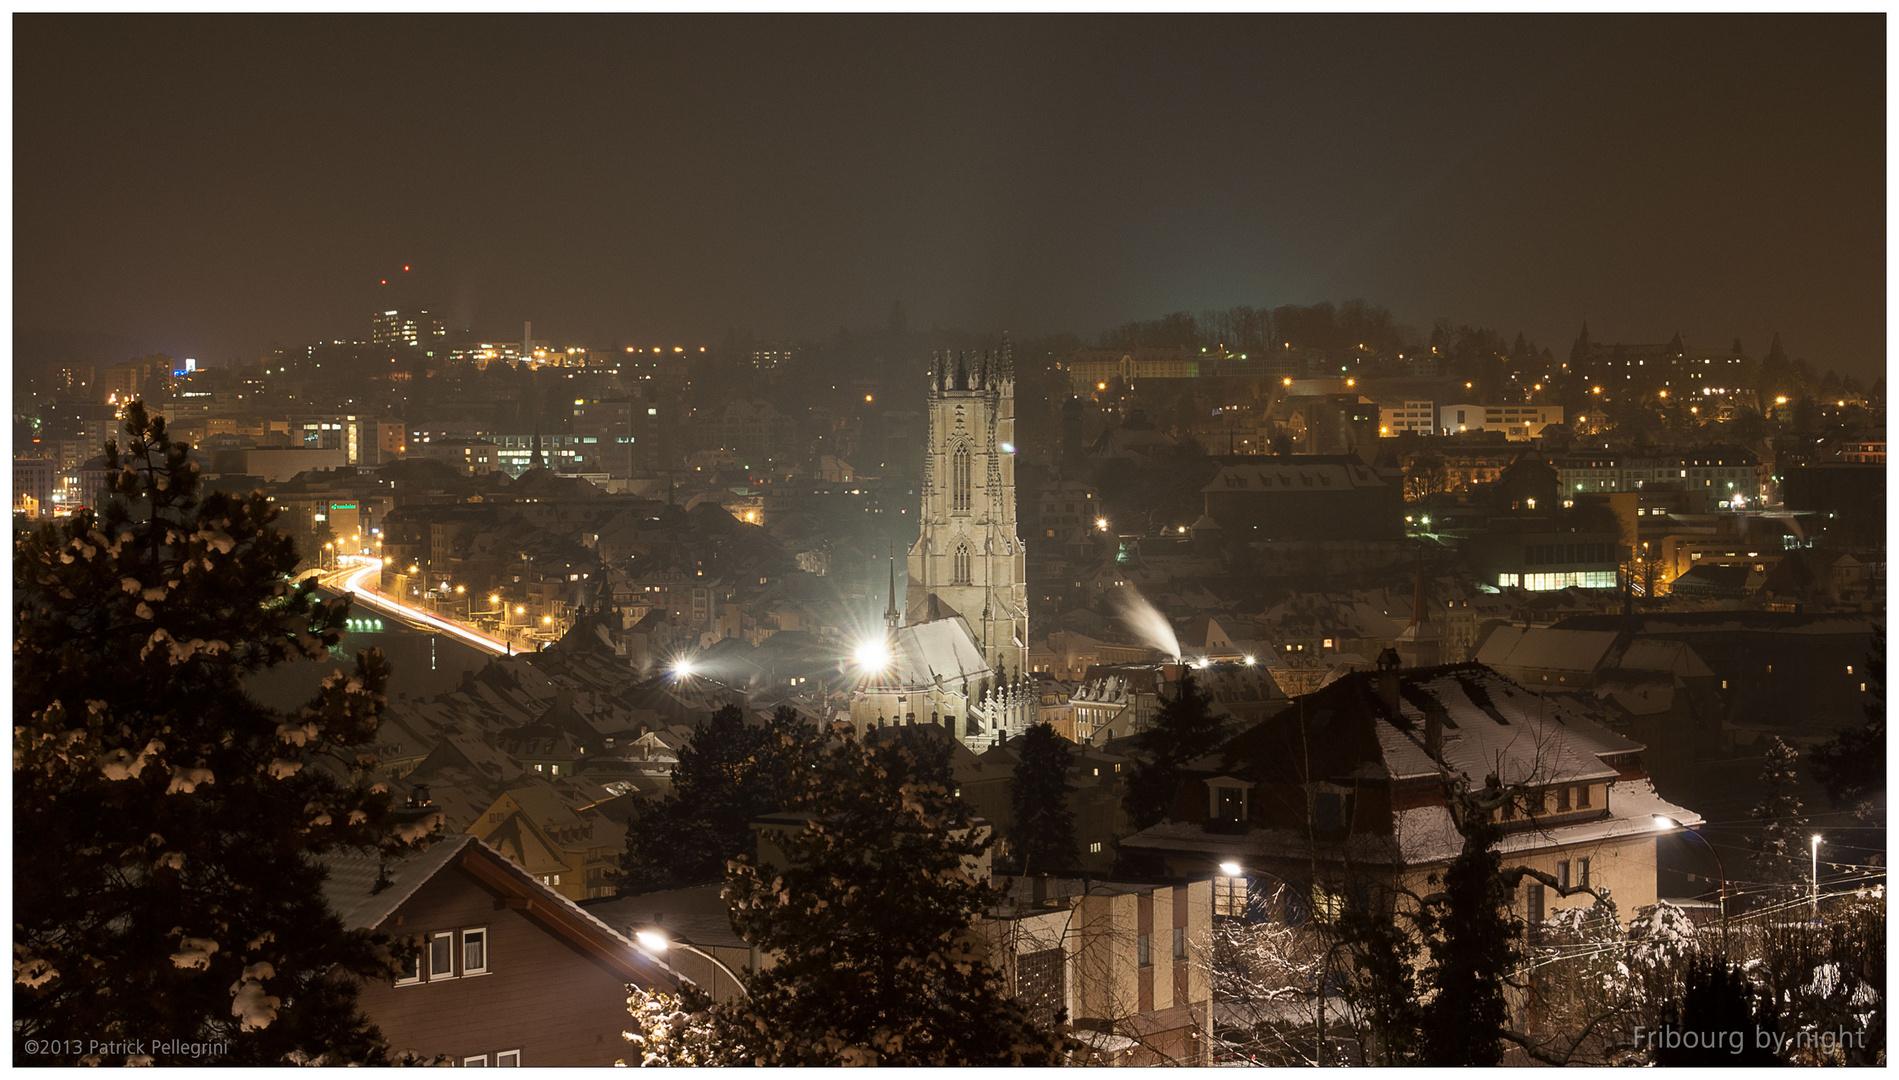 Içi c'est Fribourg ...